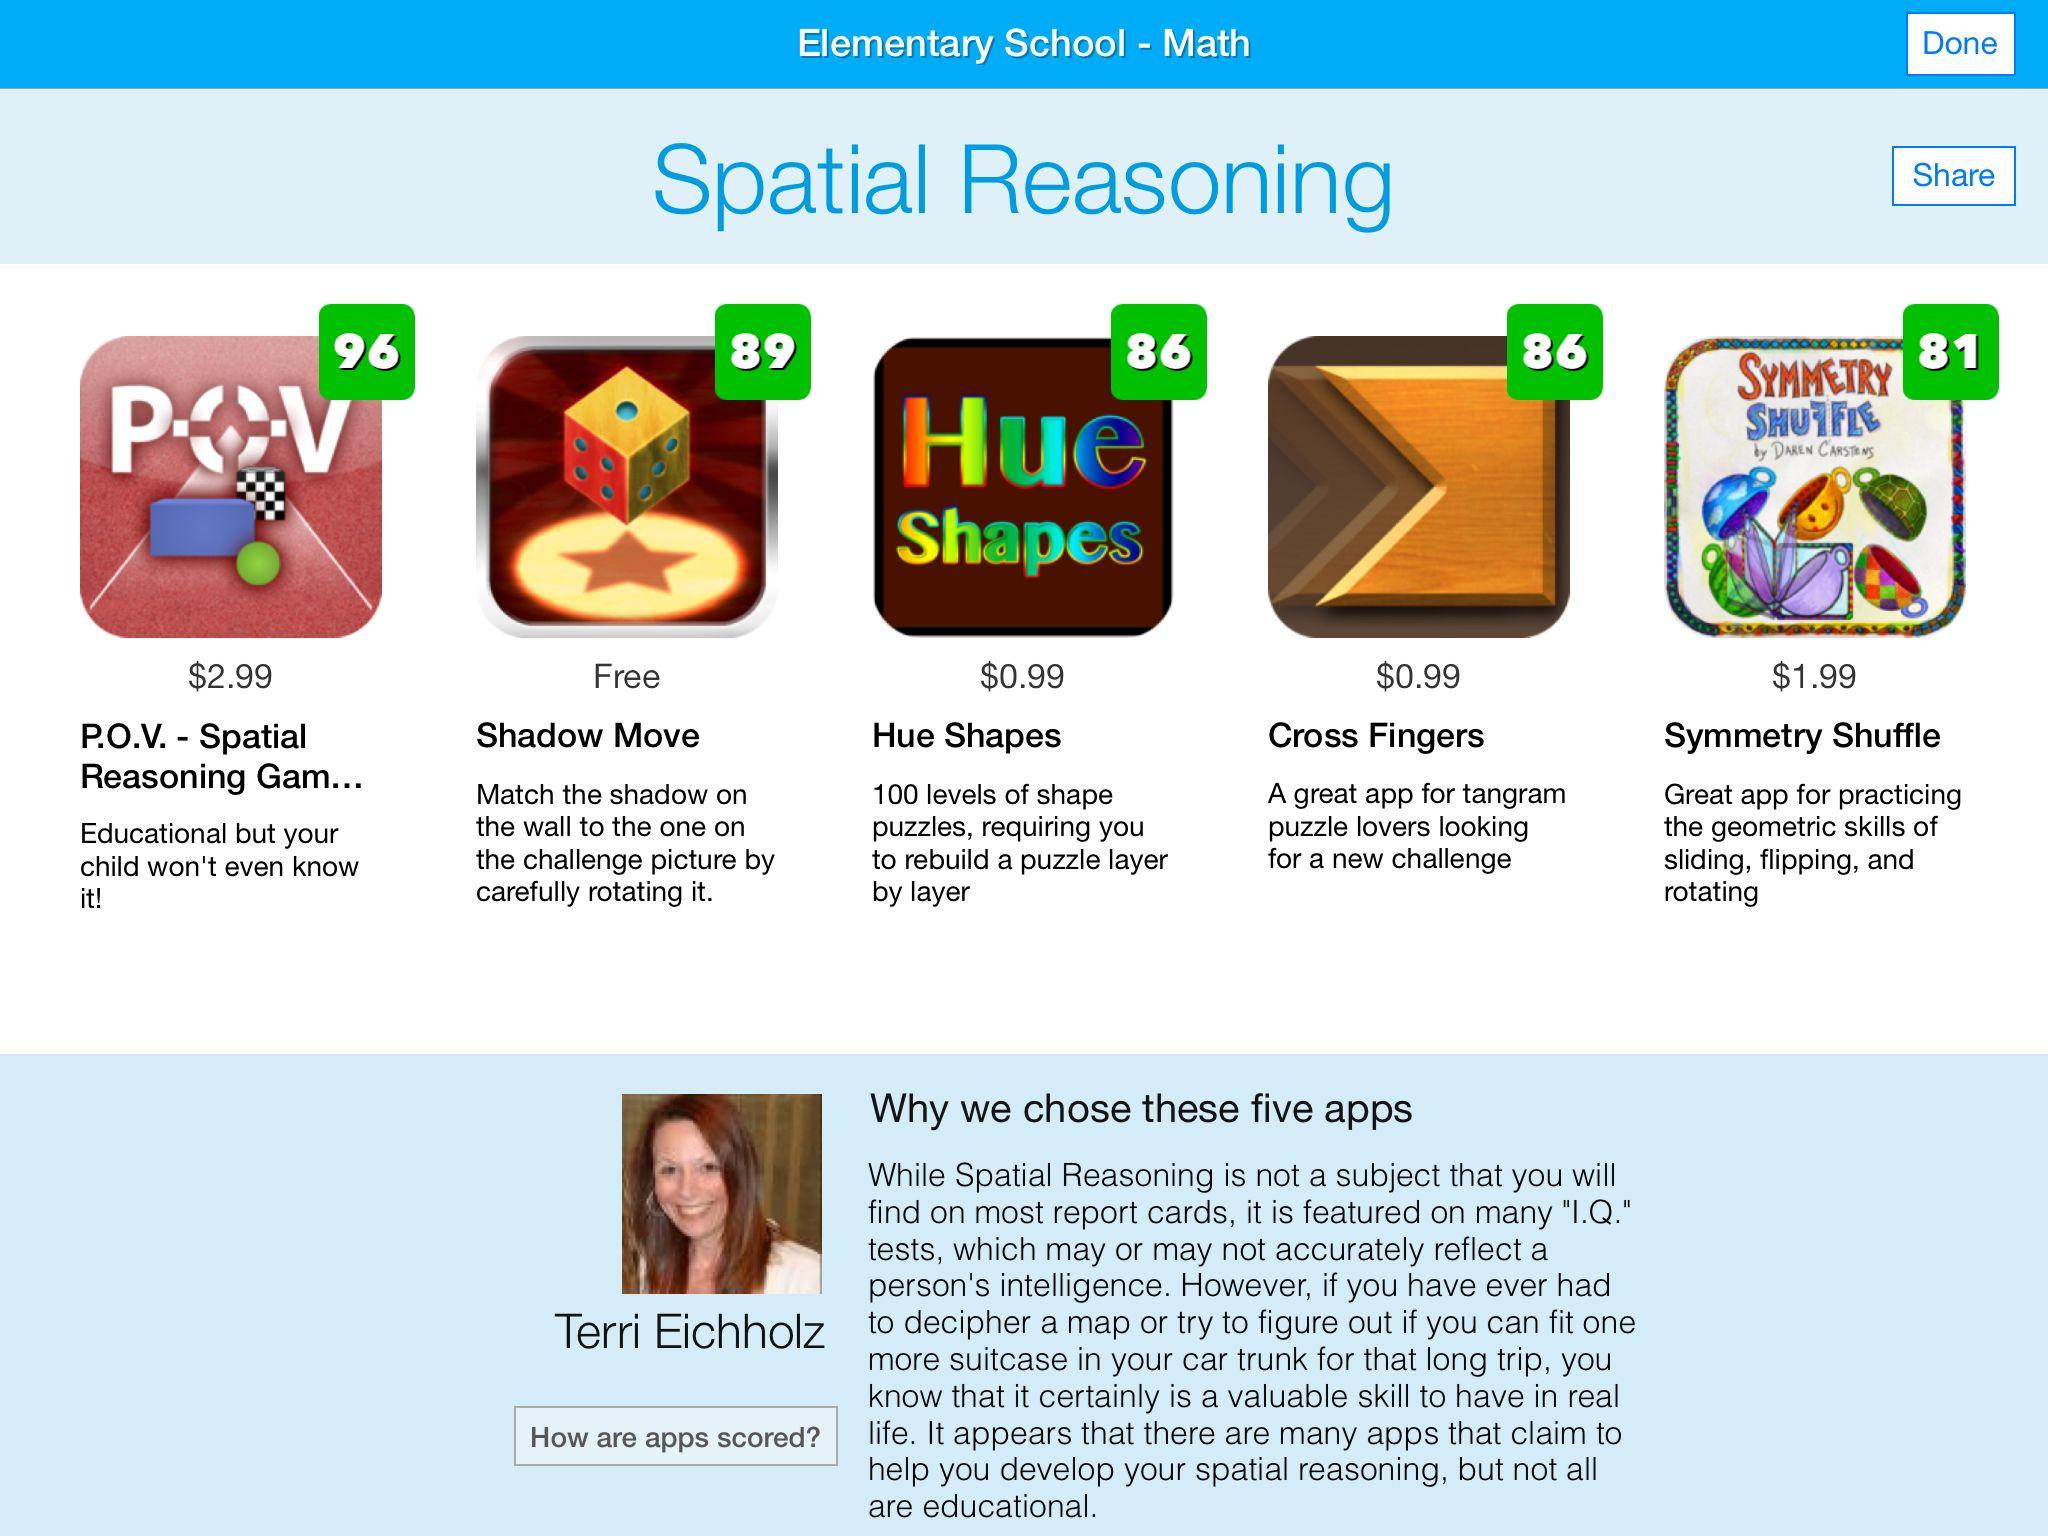 Math Spatial Reasoning Apps Elementary schools, Math, App